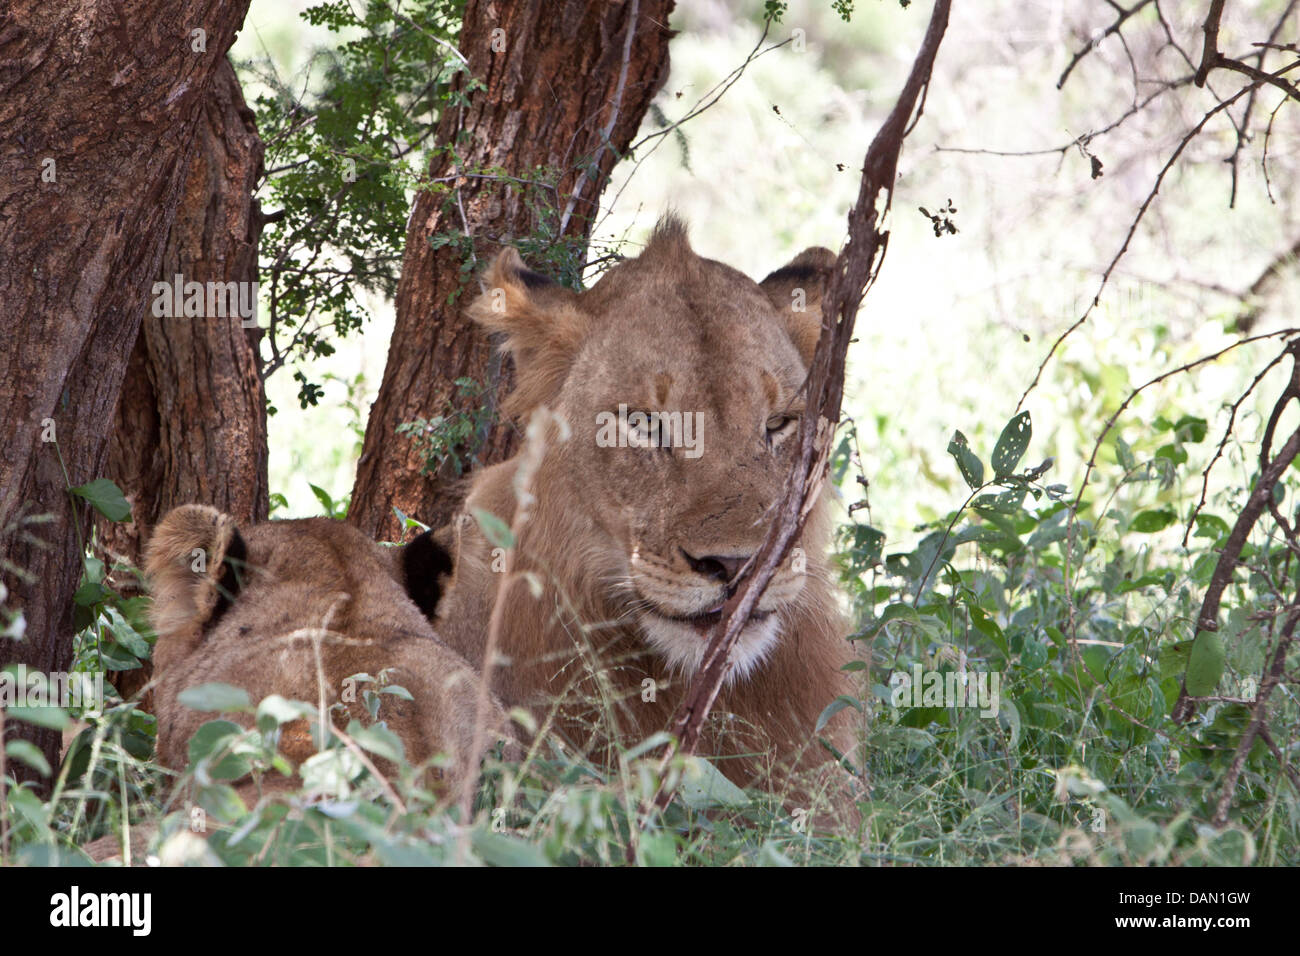 lions, panthera leo, kruger national park, south africa - Stock Image